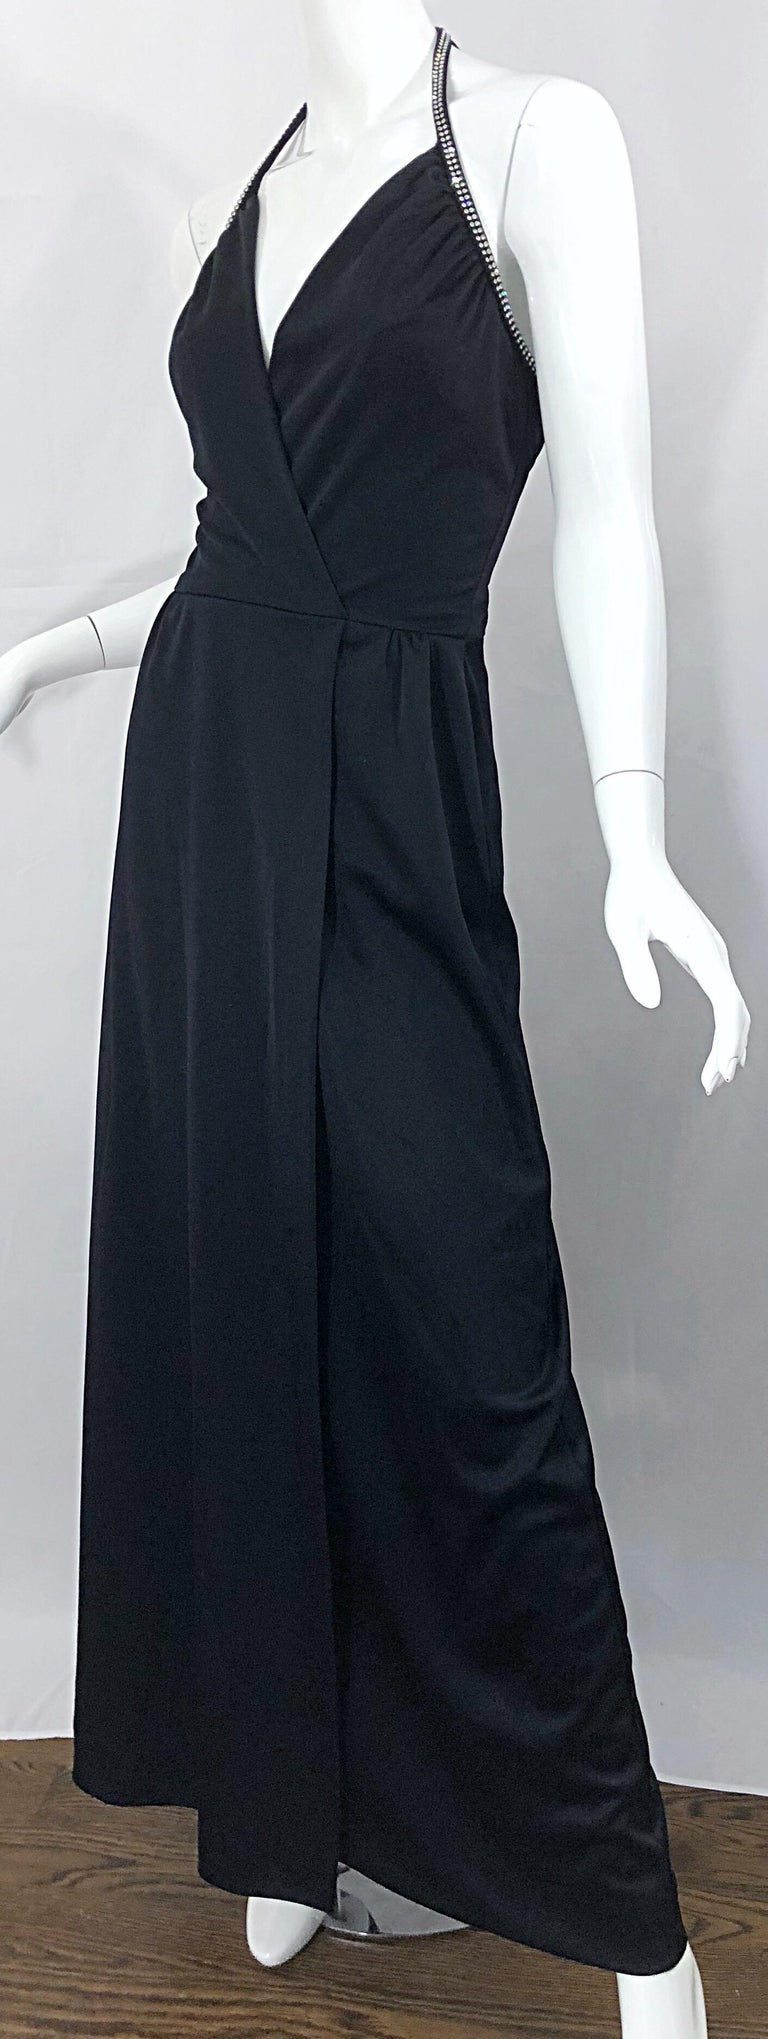 1970s Lilli Diamond Black Jersey Rhinestone Vintage 70s Wrap Maxi Dress Gown For Sale 6